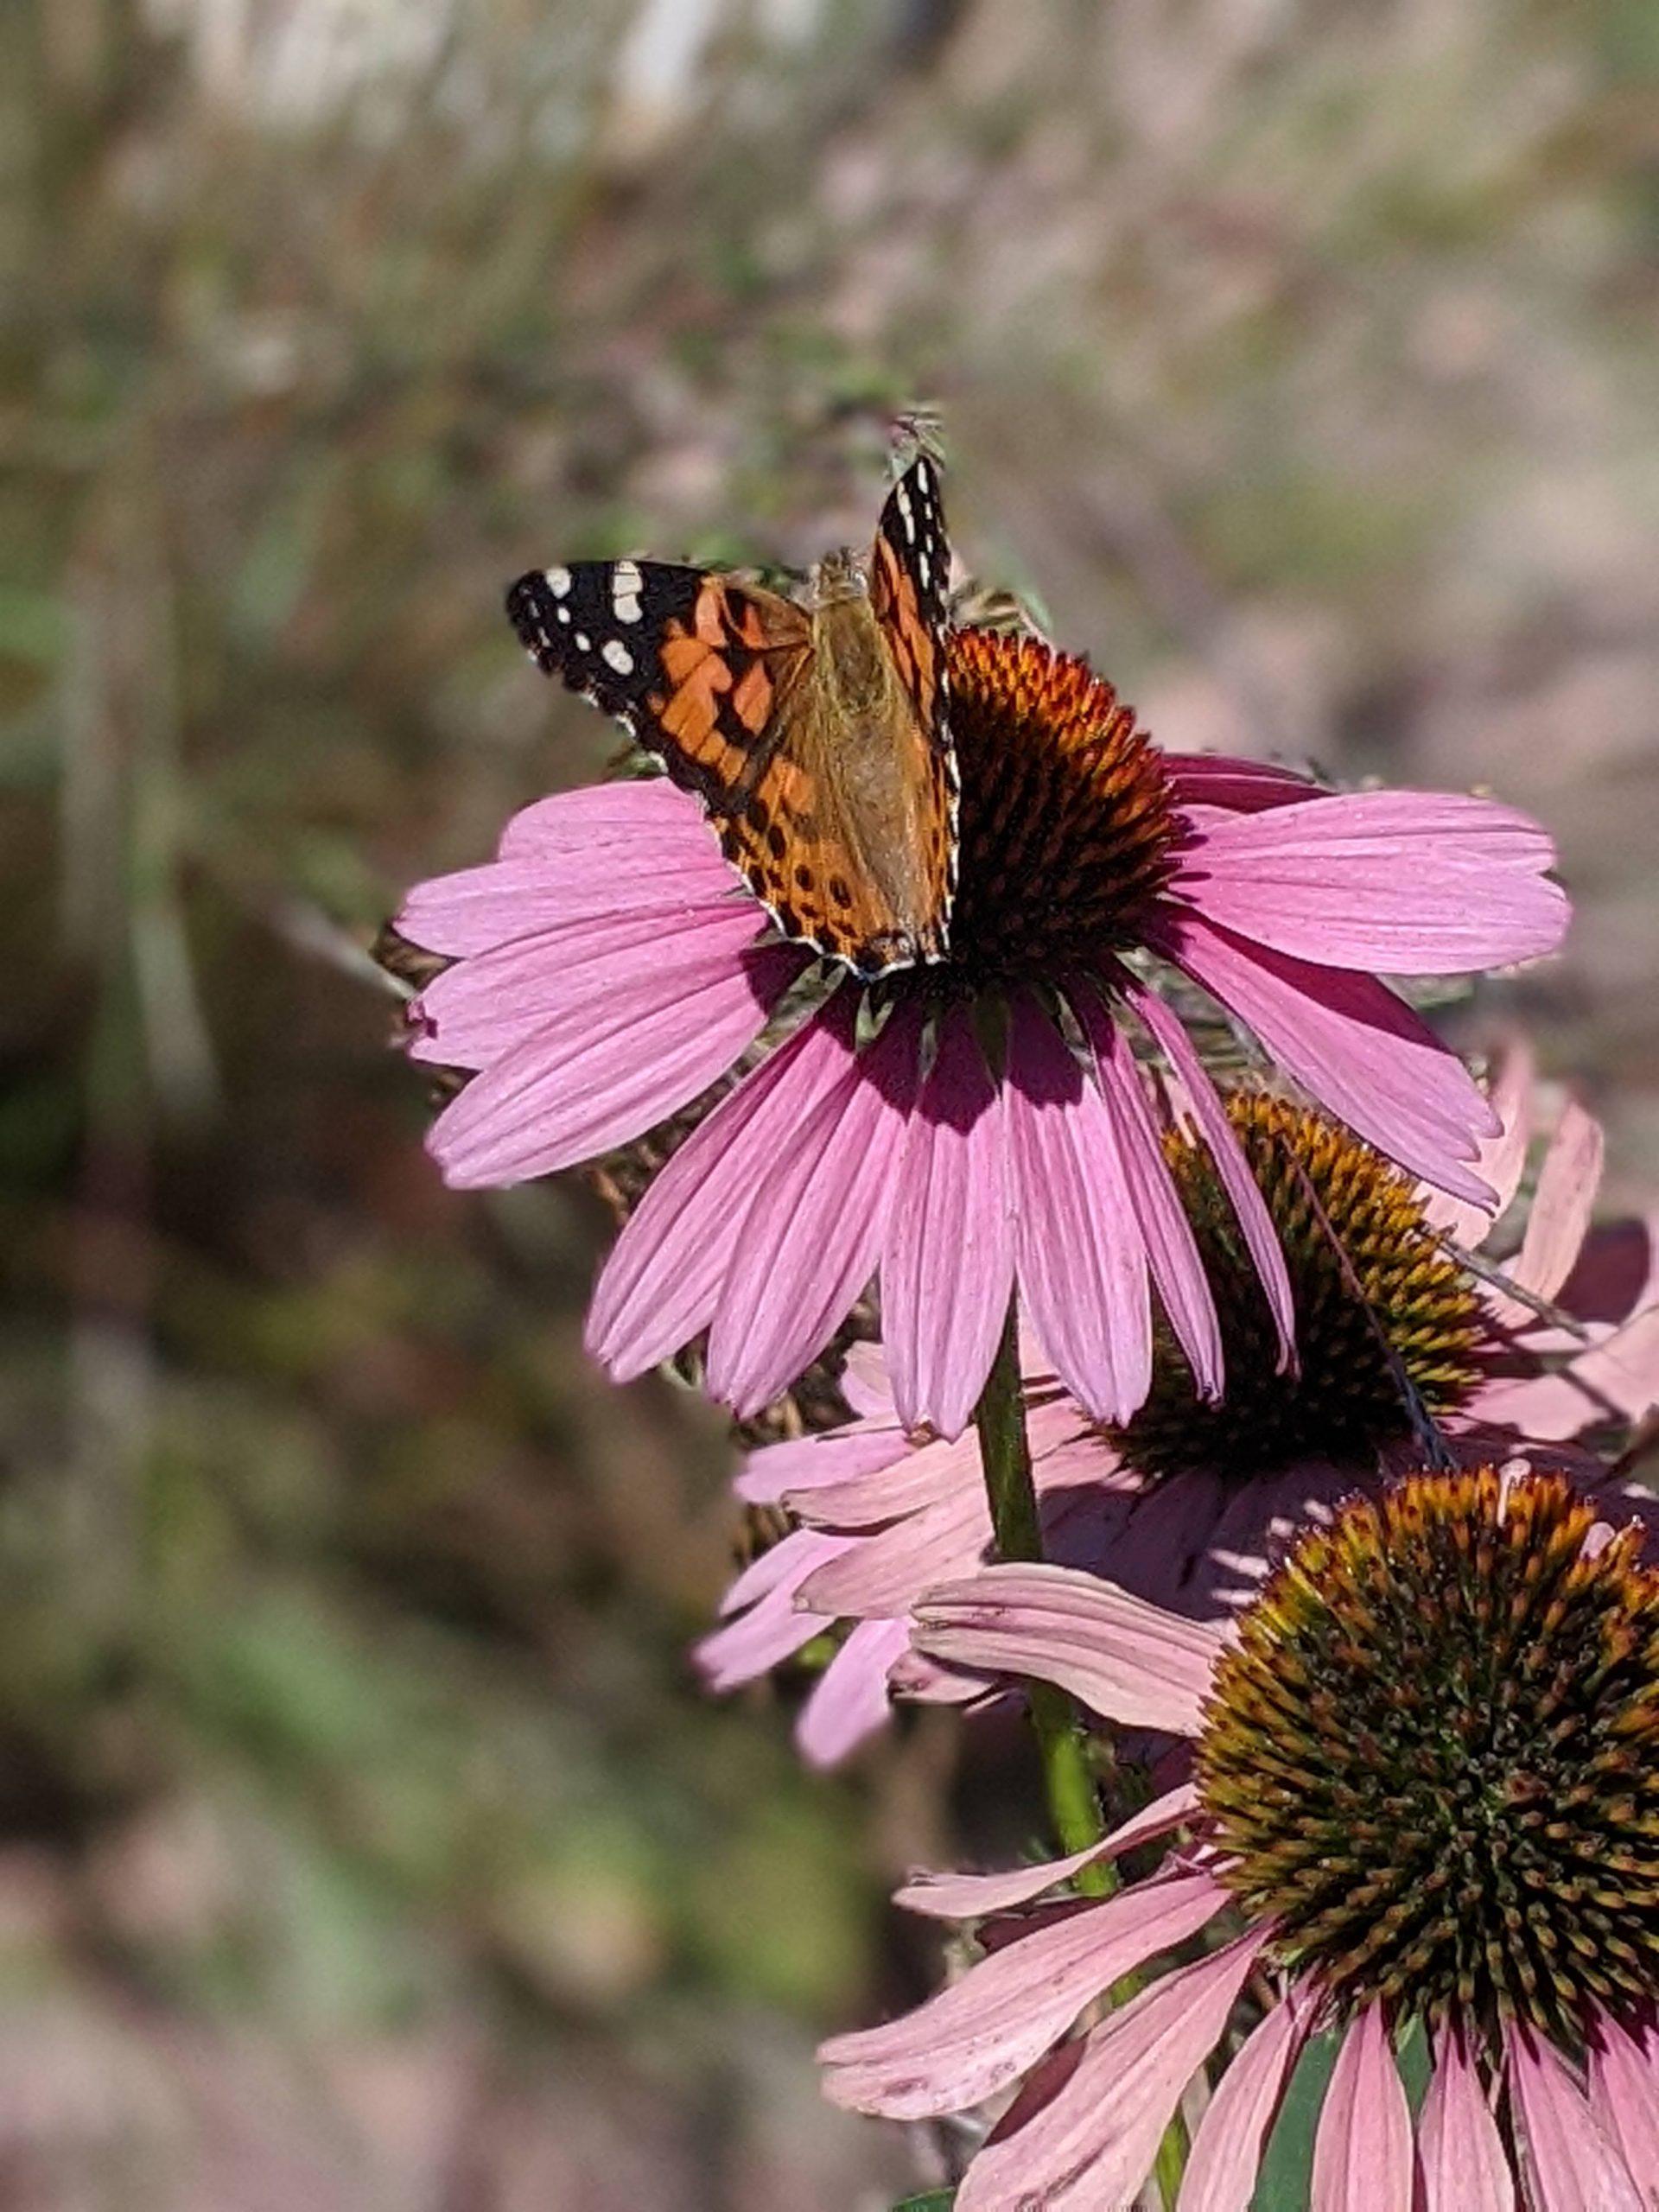 Prairie Flowers in De Smet, SD